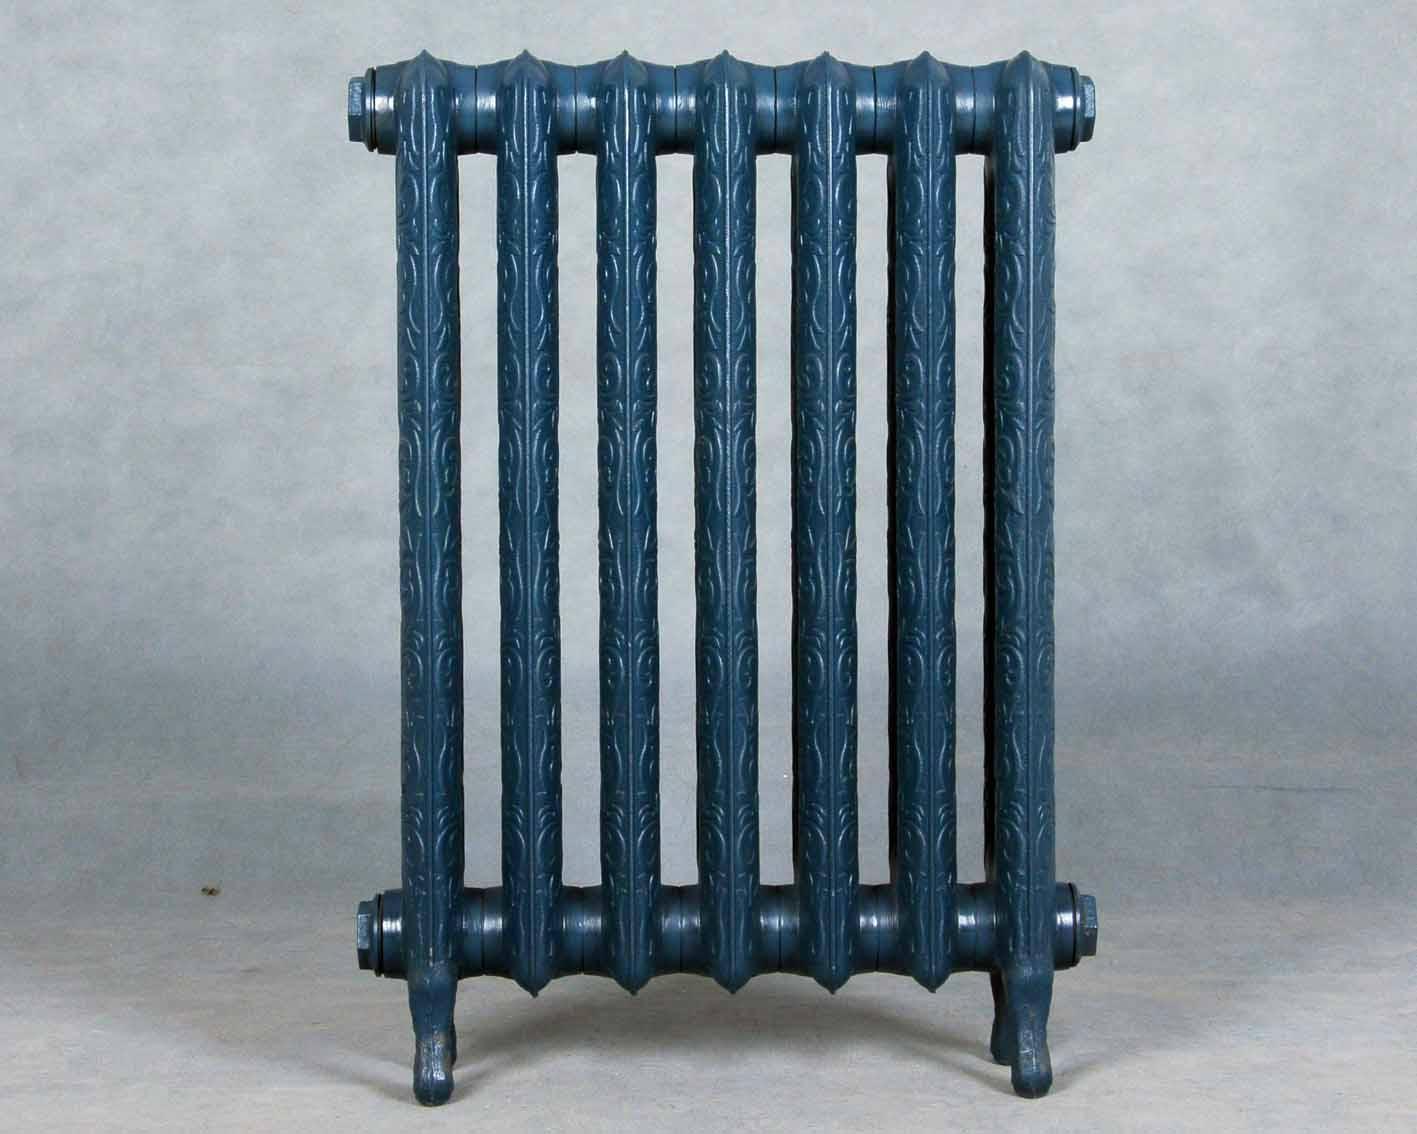 V2-760鑄鐵散熱器